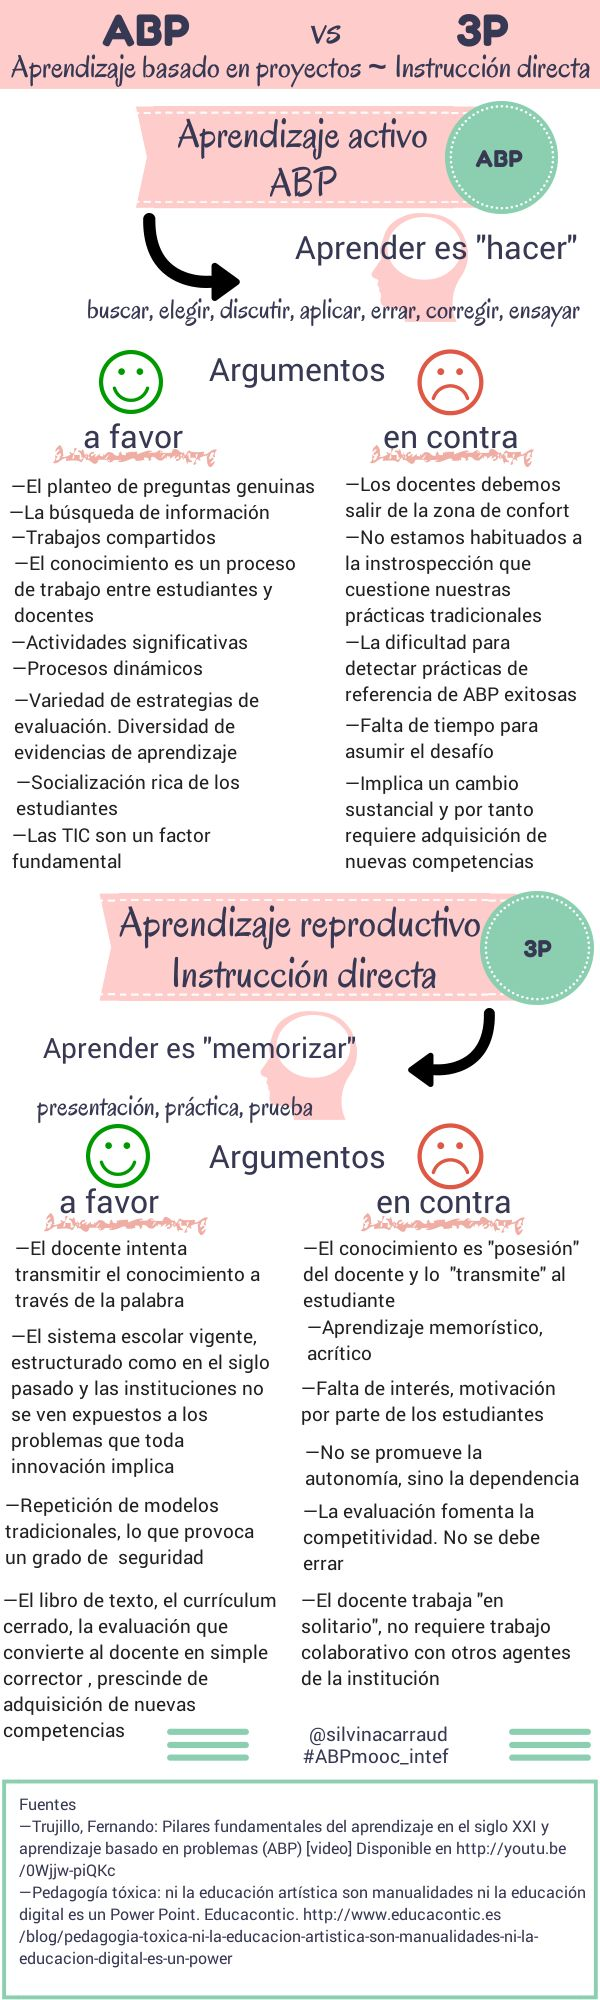 Aprendizaje activo vs Aprendizaje reproductivo #infografia #infographic #education